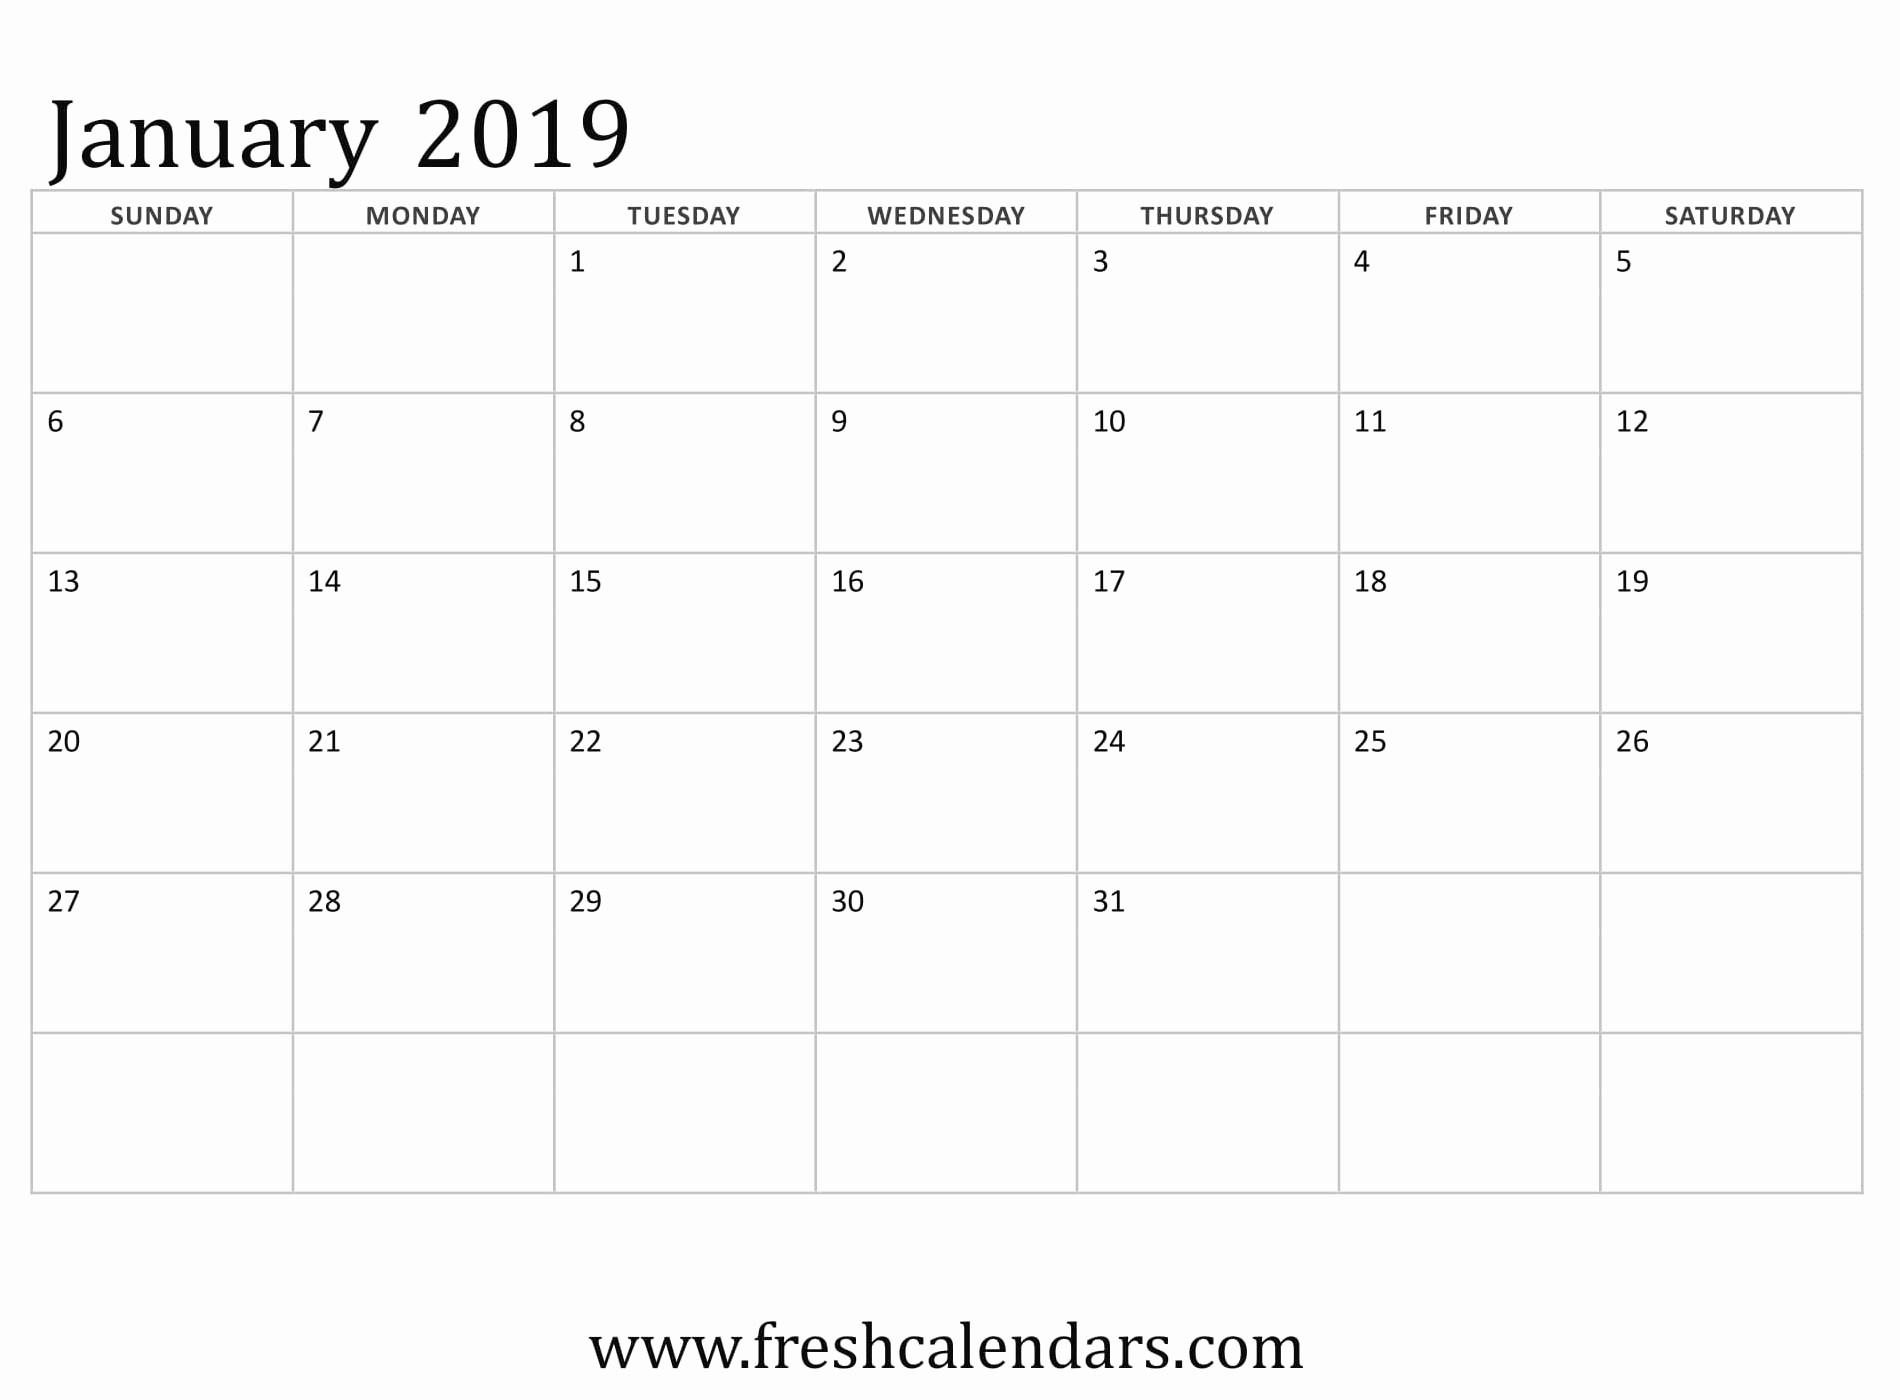 Blank January 2019 Calendar Template Luxury Blank January 2019 Calendar Printable Templates